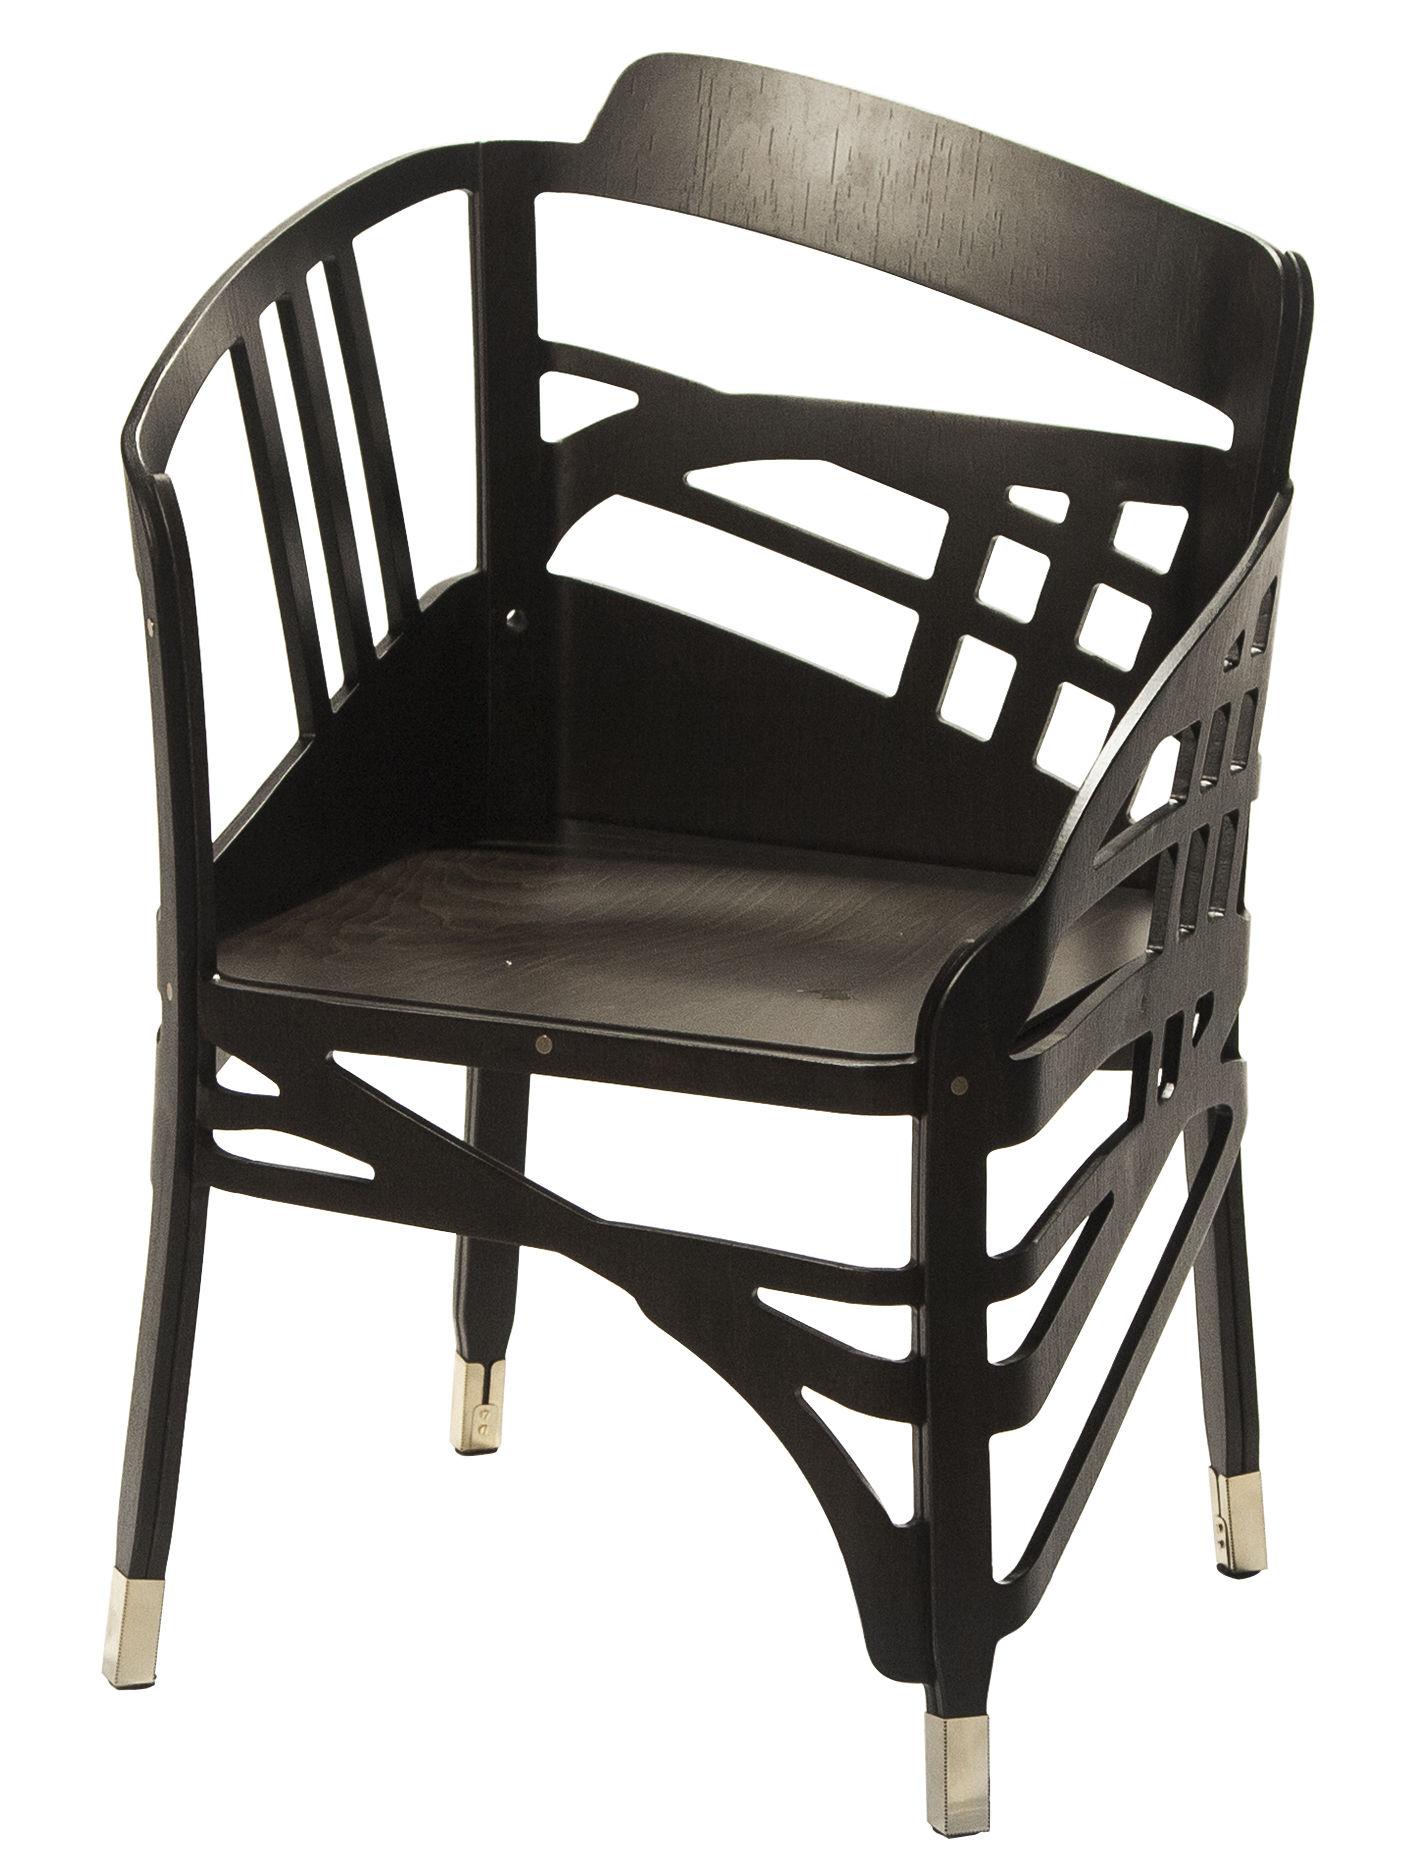 the hidden chairs wagner optische t uschung ibride. Black Bedroom Furniture Sets. Home Design Ideas